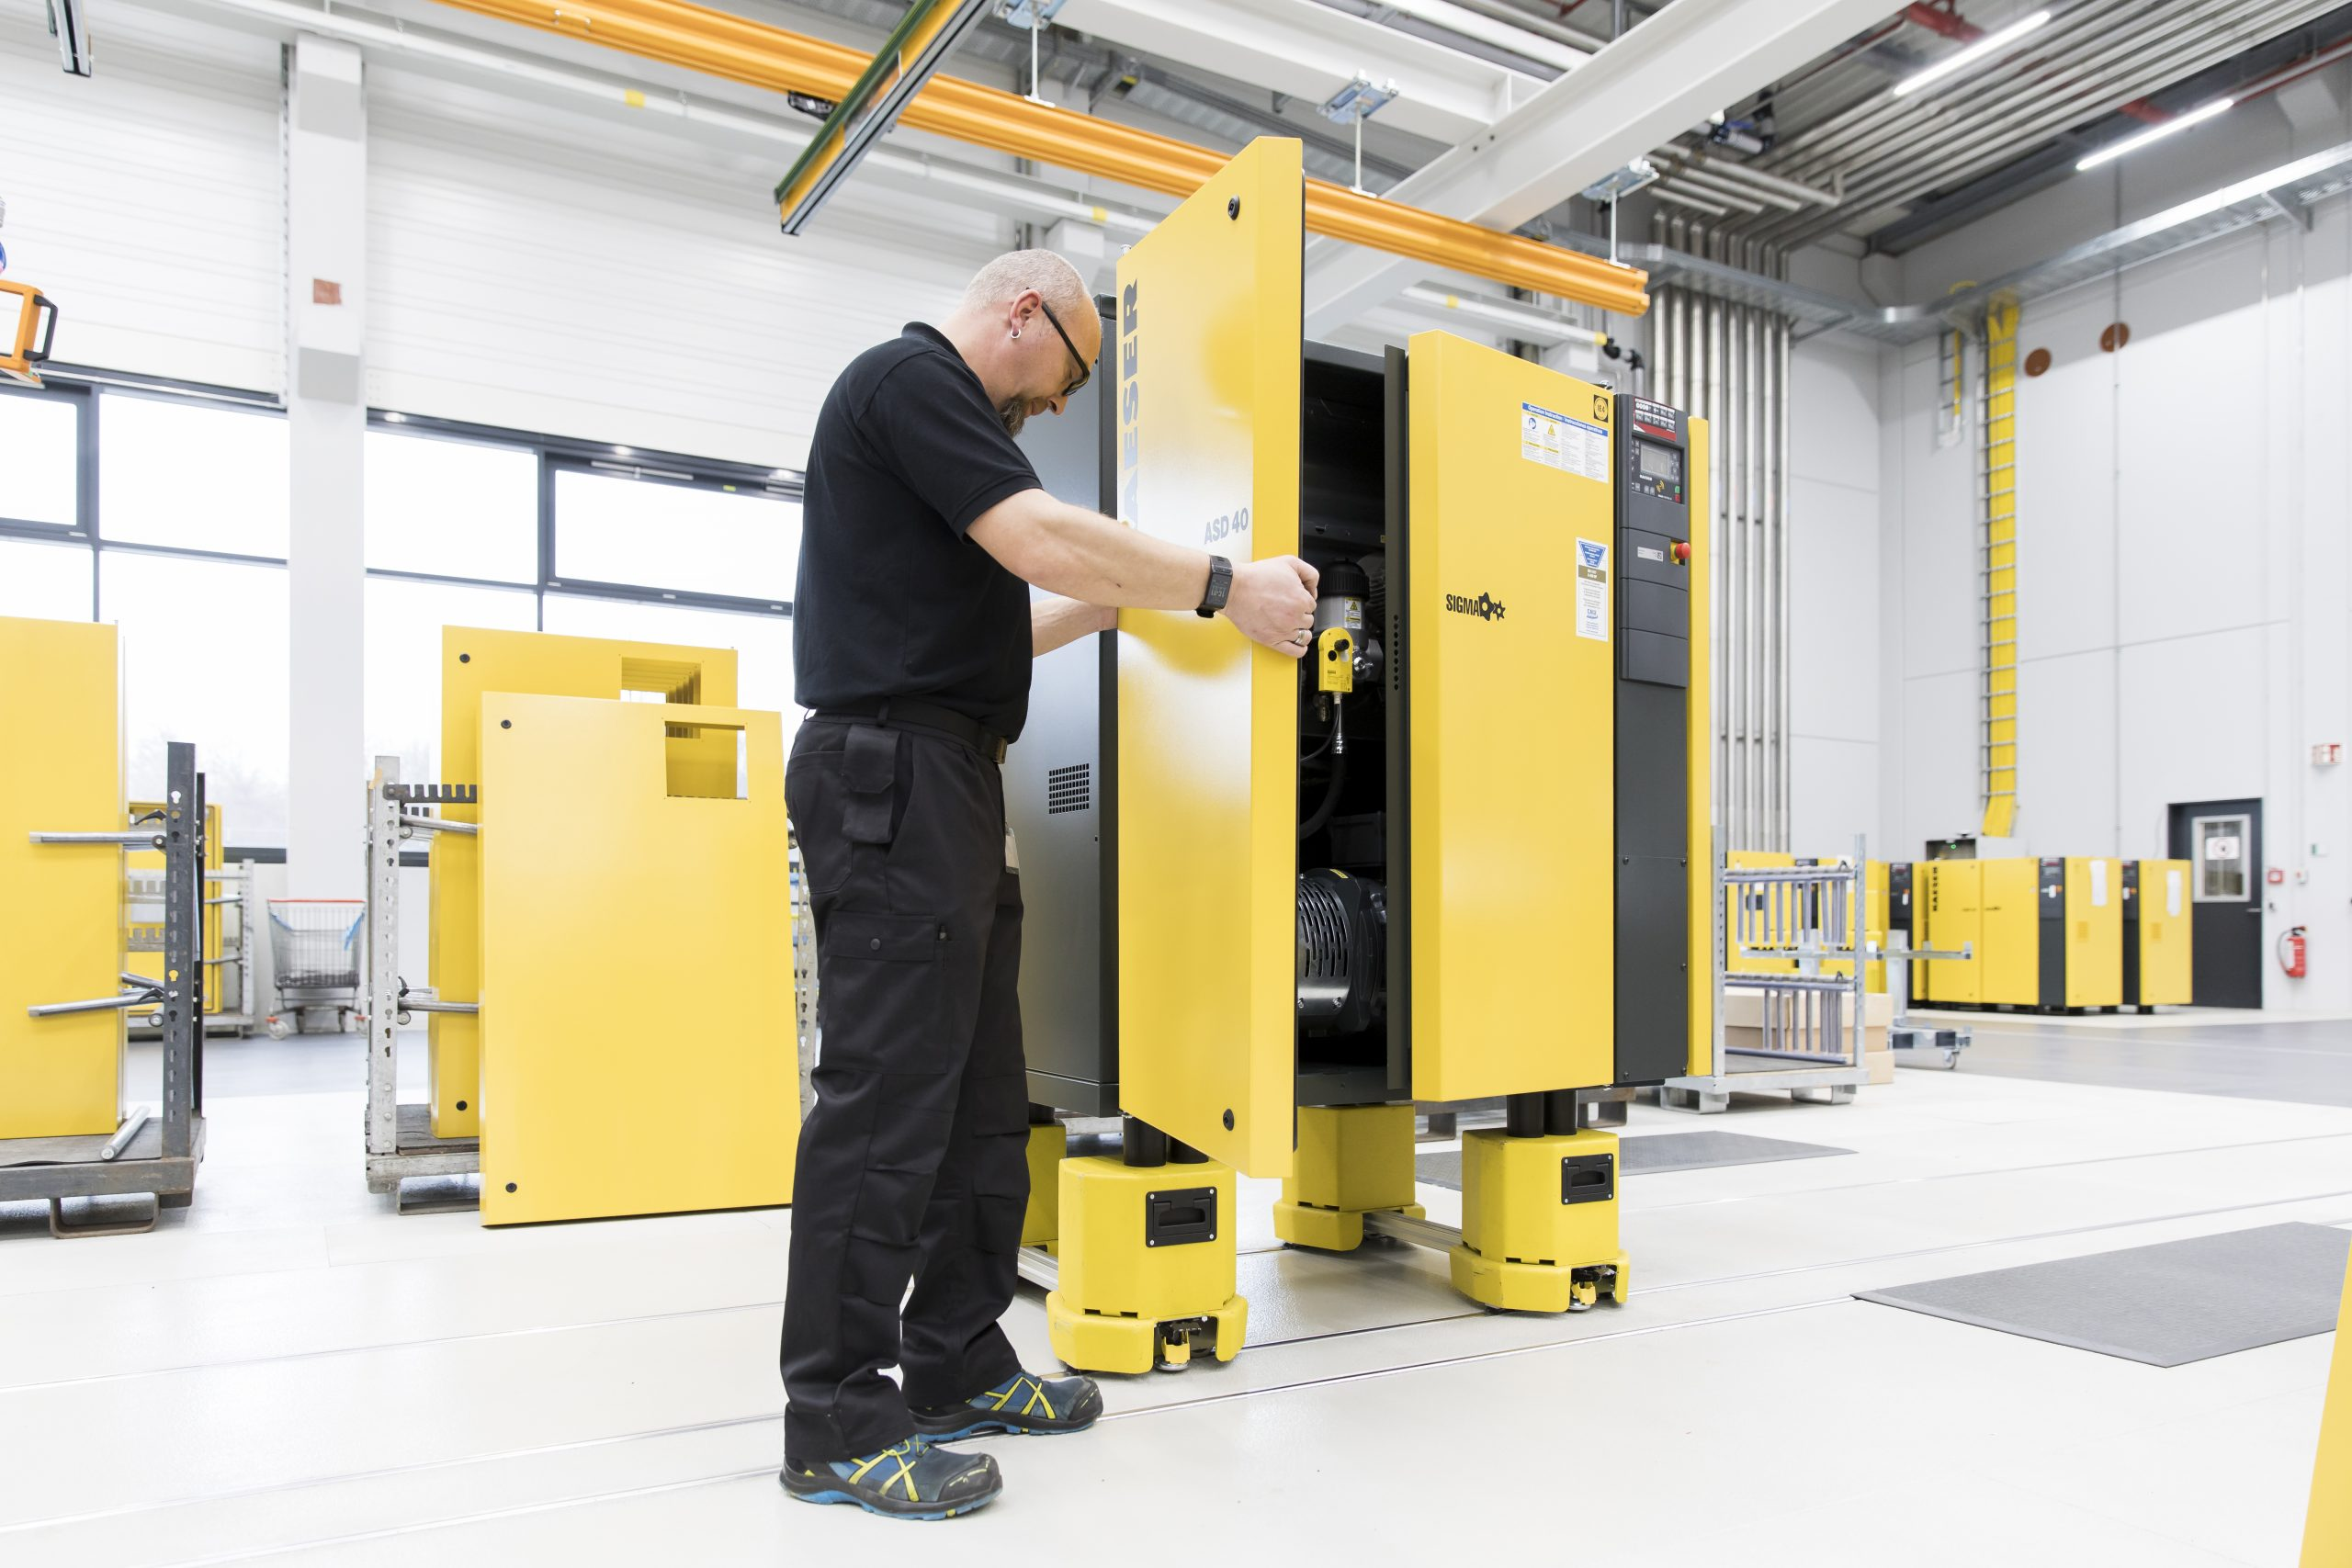 (Bild: Trebing & Himstedt Prozeßautomation GmbH & Co. KG)